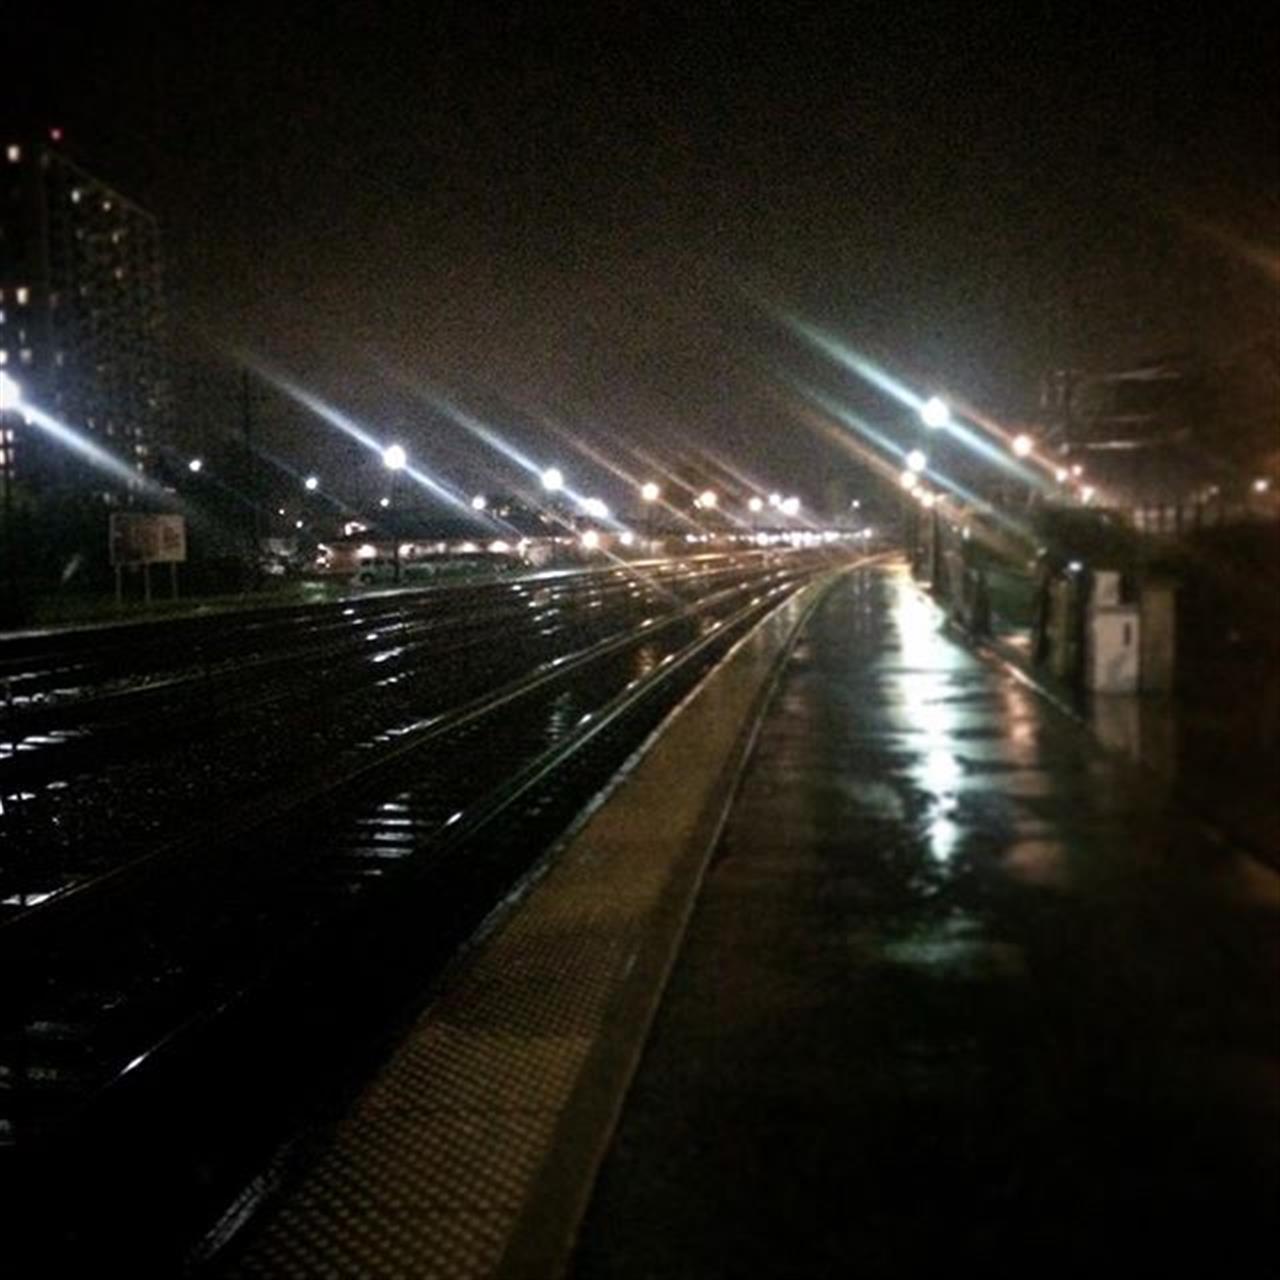 #Chicago #suburbs #metra #leadingrelocal #rainynight